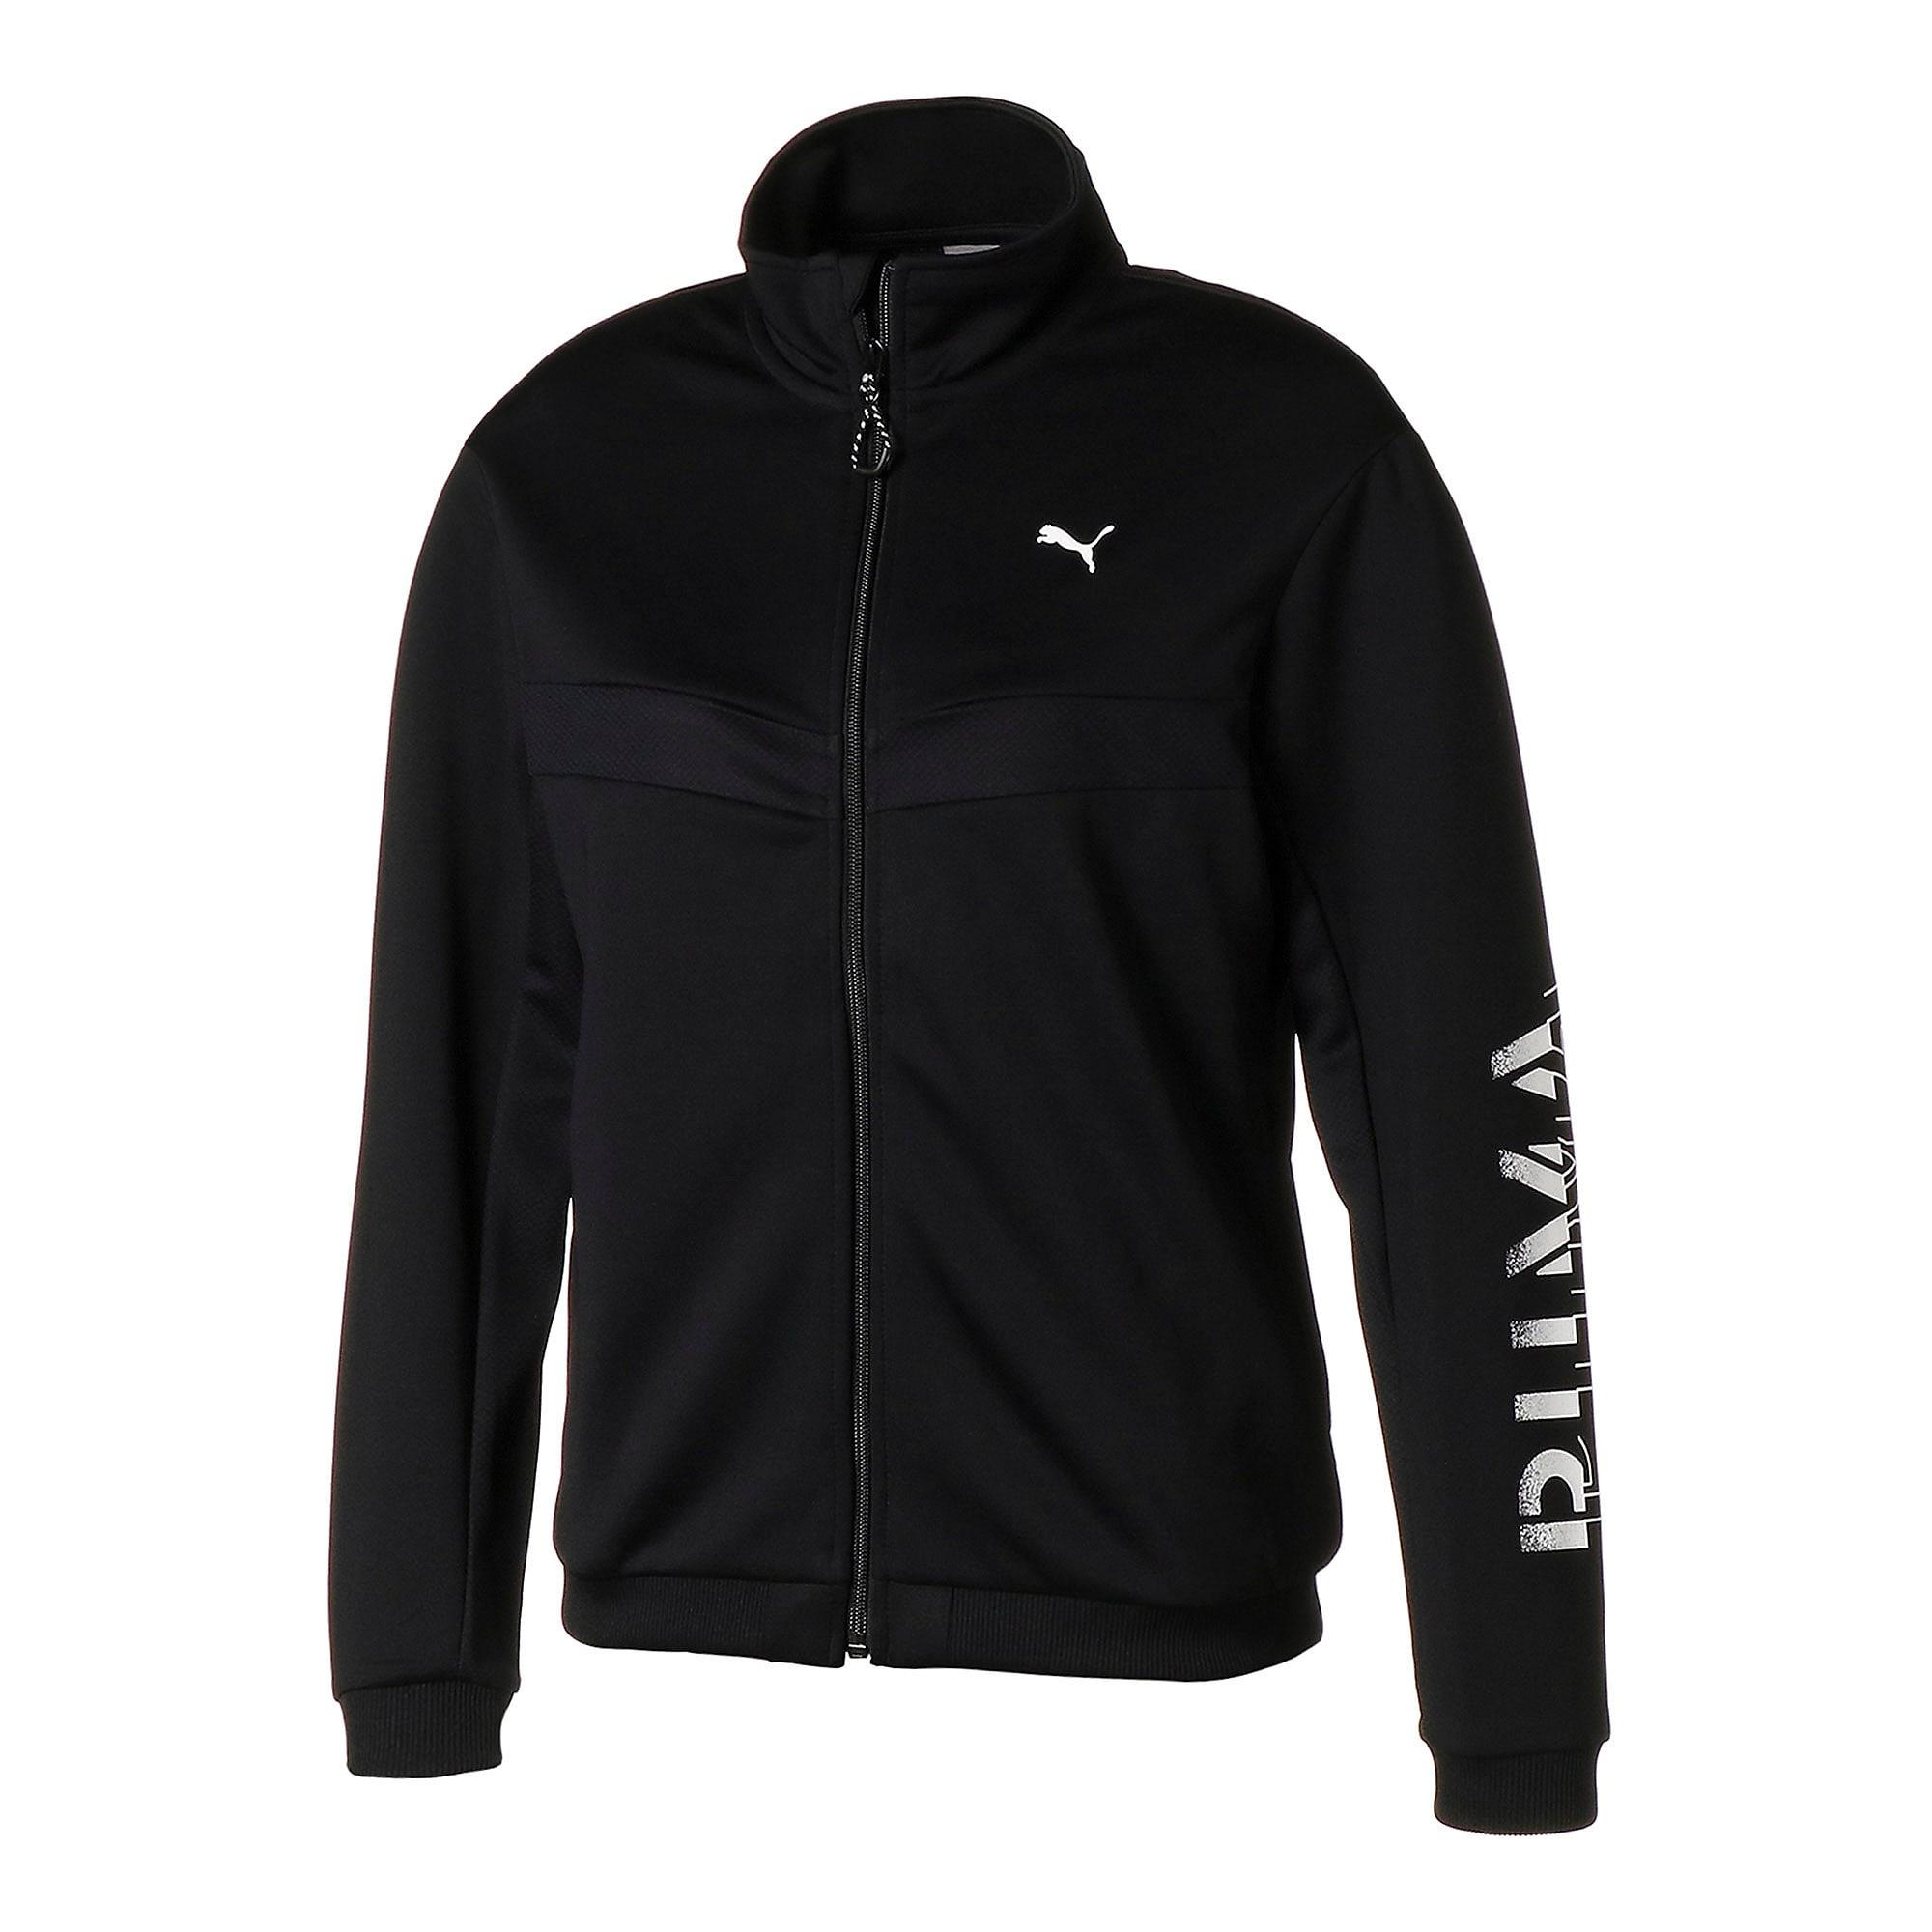 Thumbnail 1 of フィール イット ウィメンズ トレーニング ジャケット, Puma Black, medium-JPN